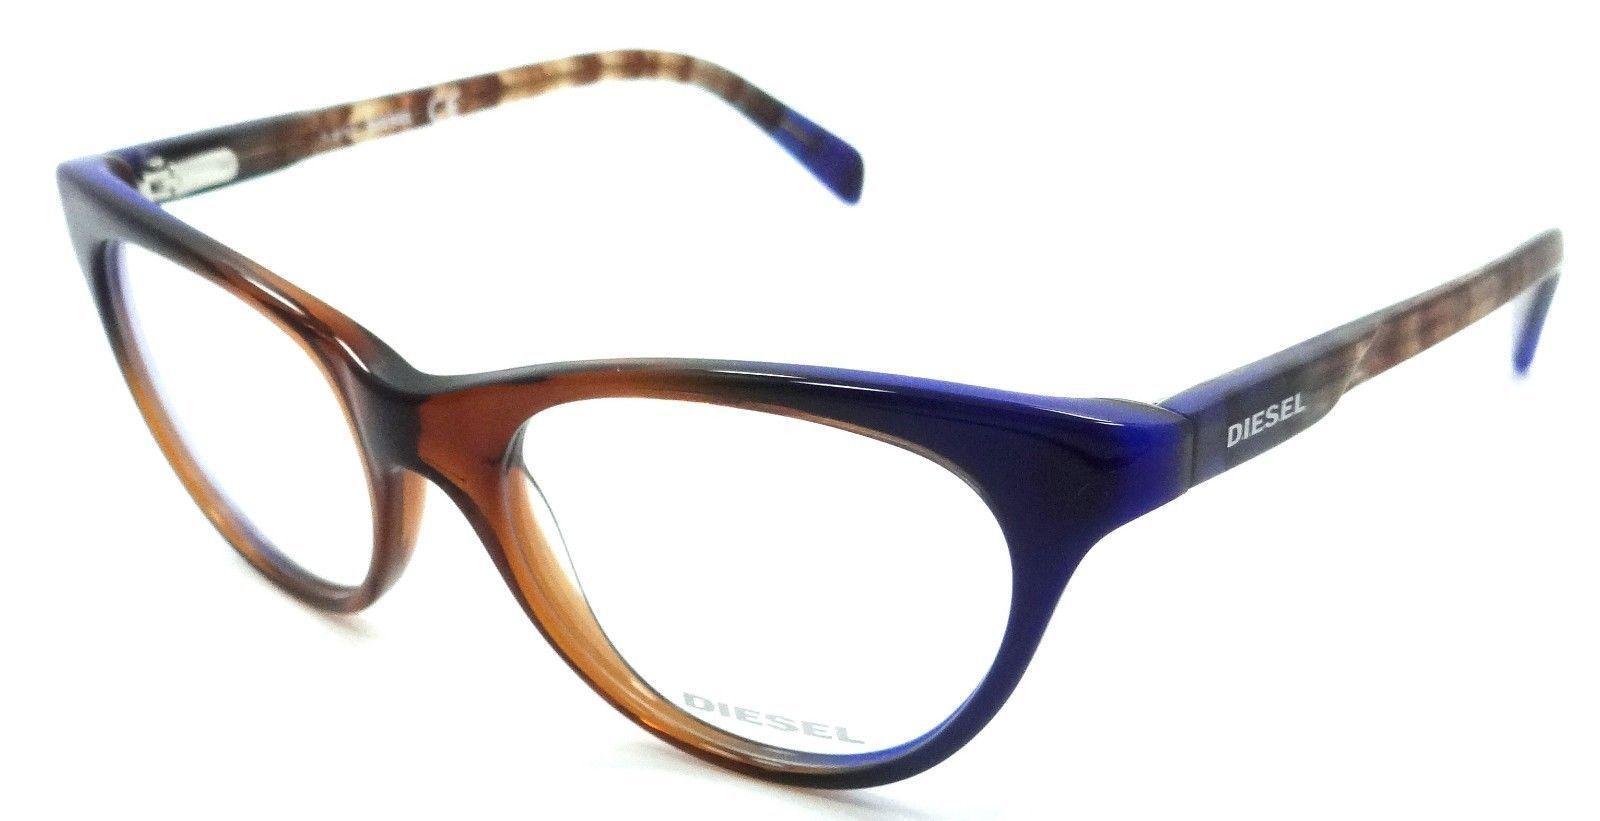 8599f0f304 Diesel Rx Eyeglasses Frames DL5056 092 and similar items. 57